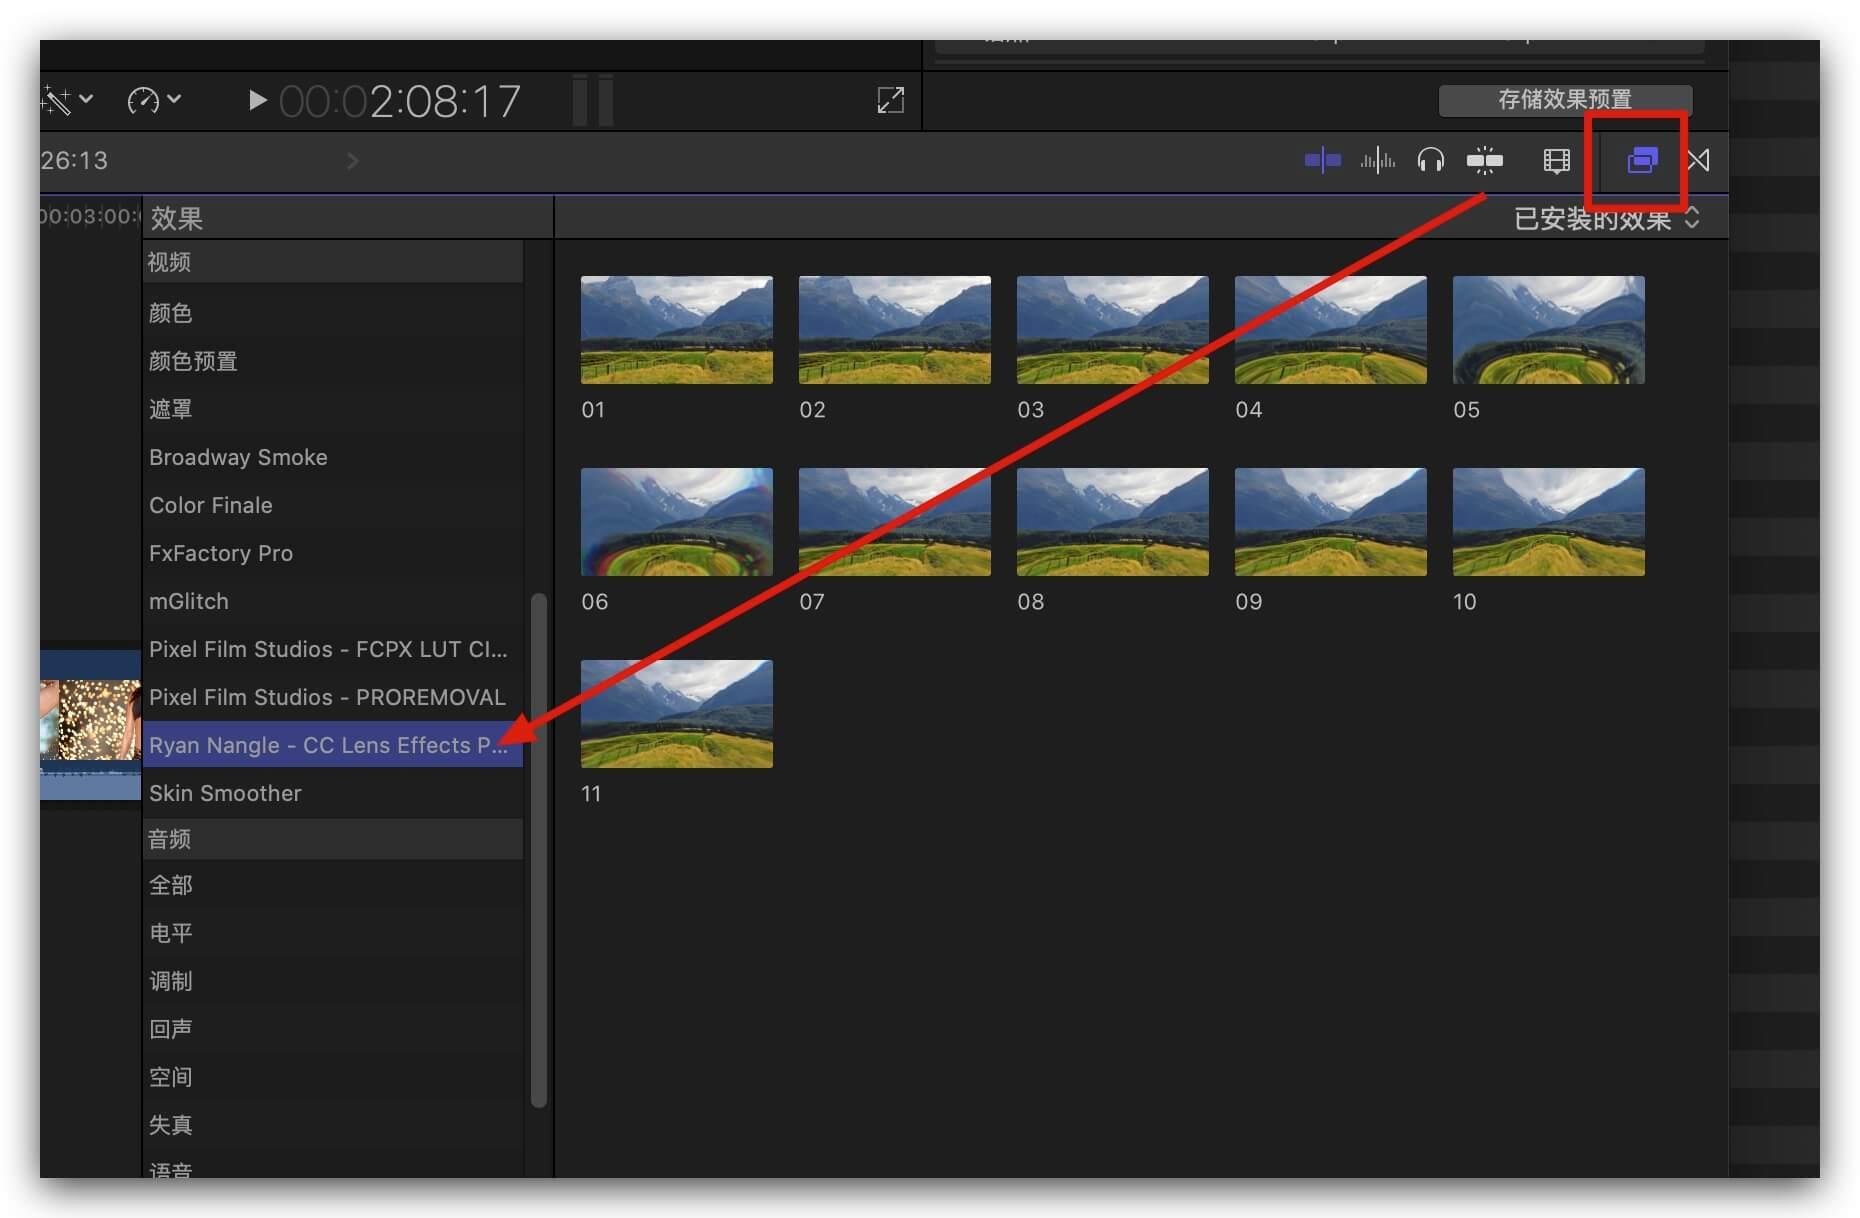 fcpx效果插件 11组镜头广角失真效果预设 完整版 CC Lens Effects Pack